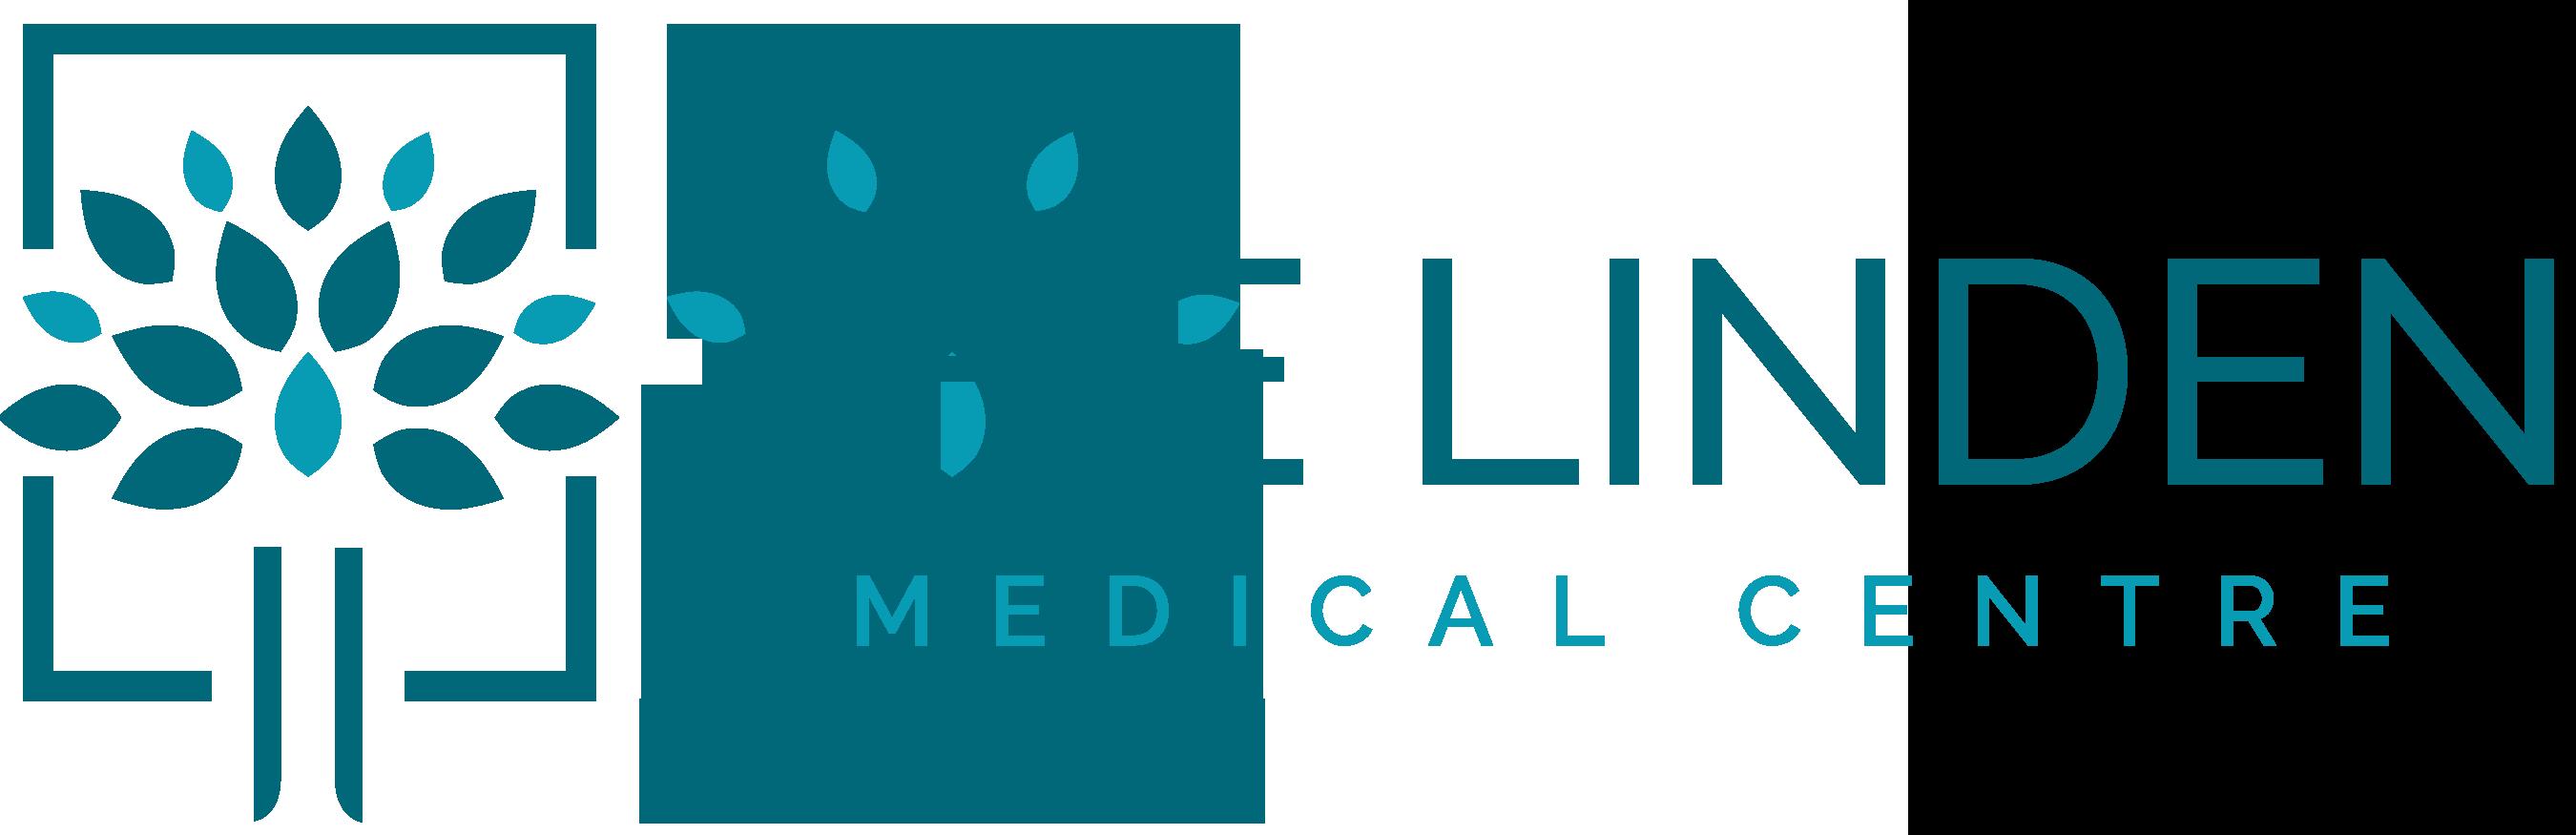 The Linden Medical Centre